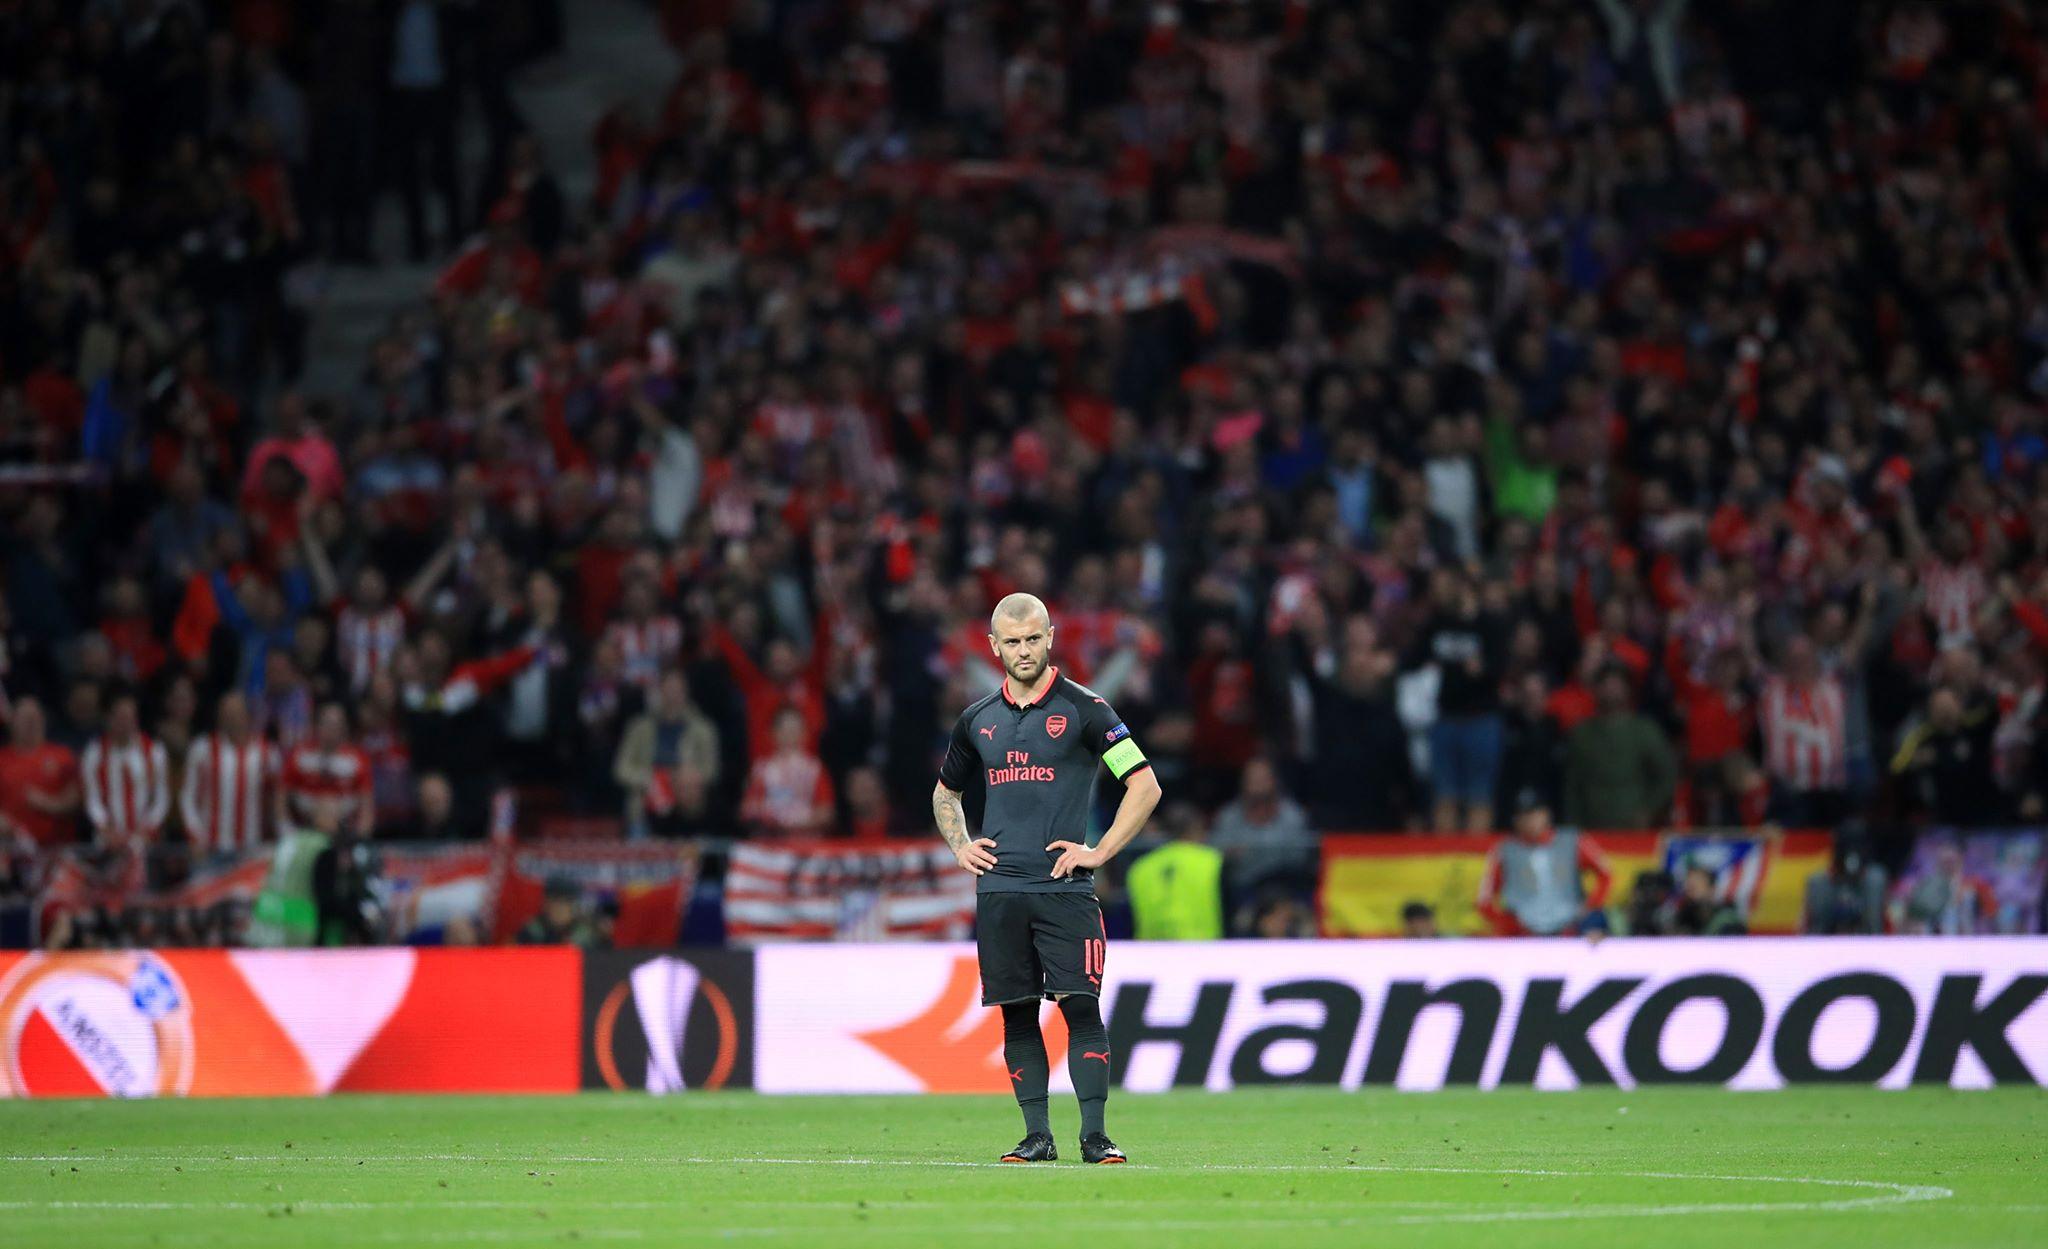 Wilshere cuts a dejected figure during the Europa League semi-final. Image: PA